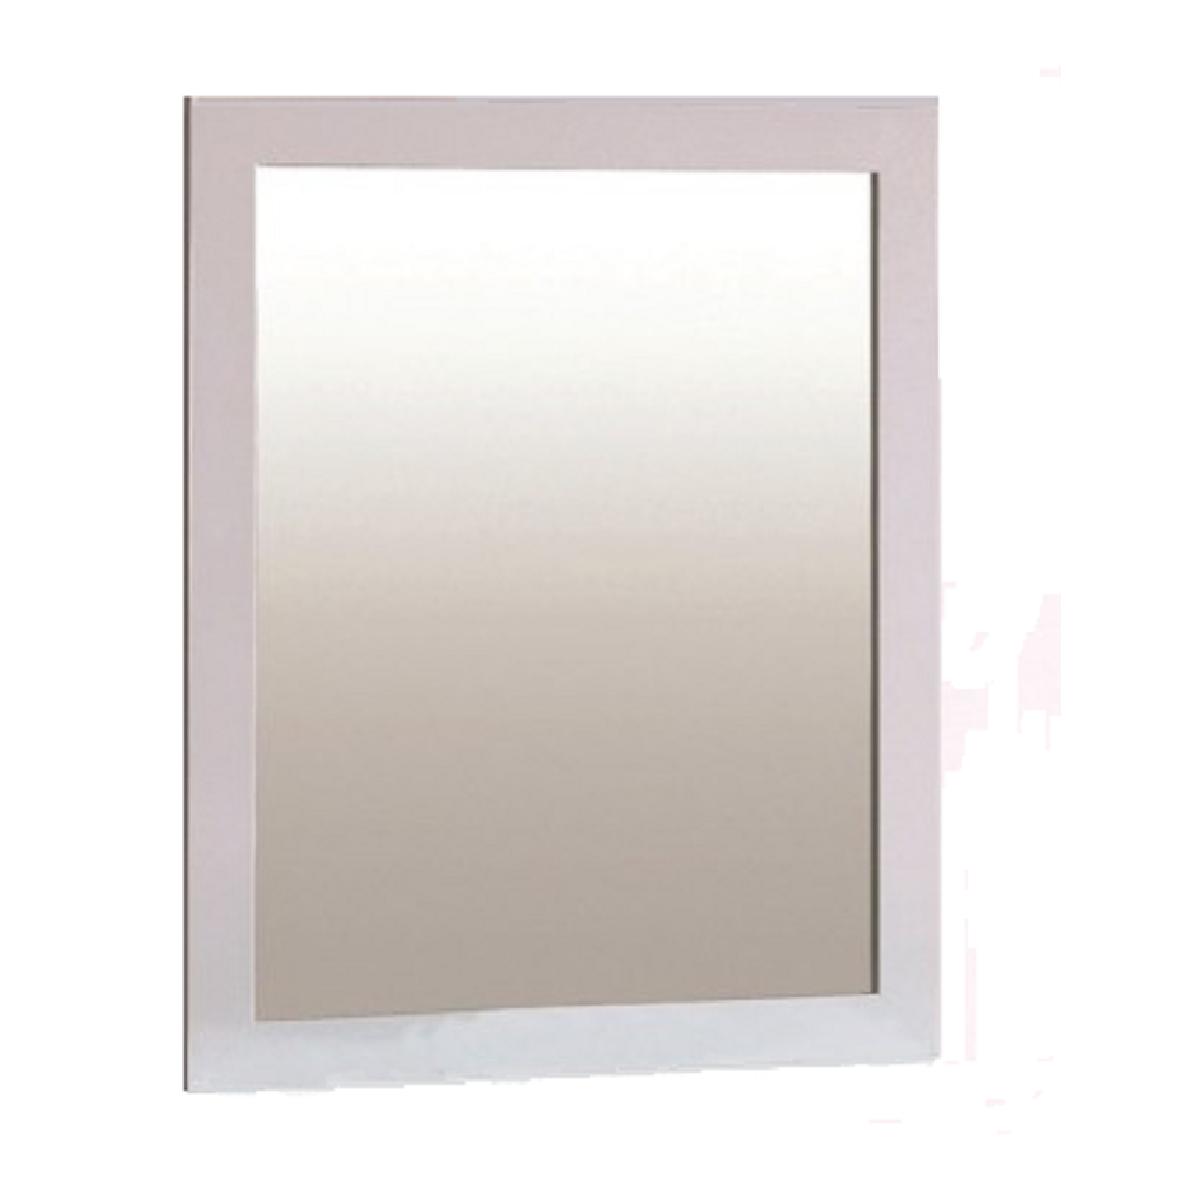 Mirabel 3240 mr miroir blanc for Monsieur du miroir